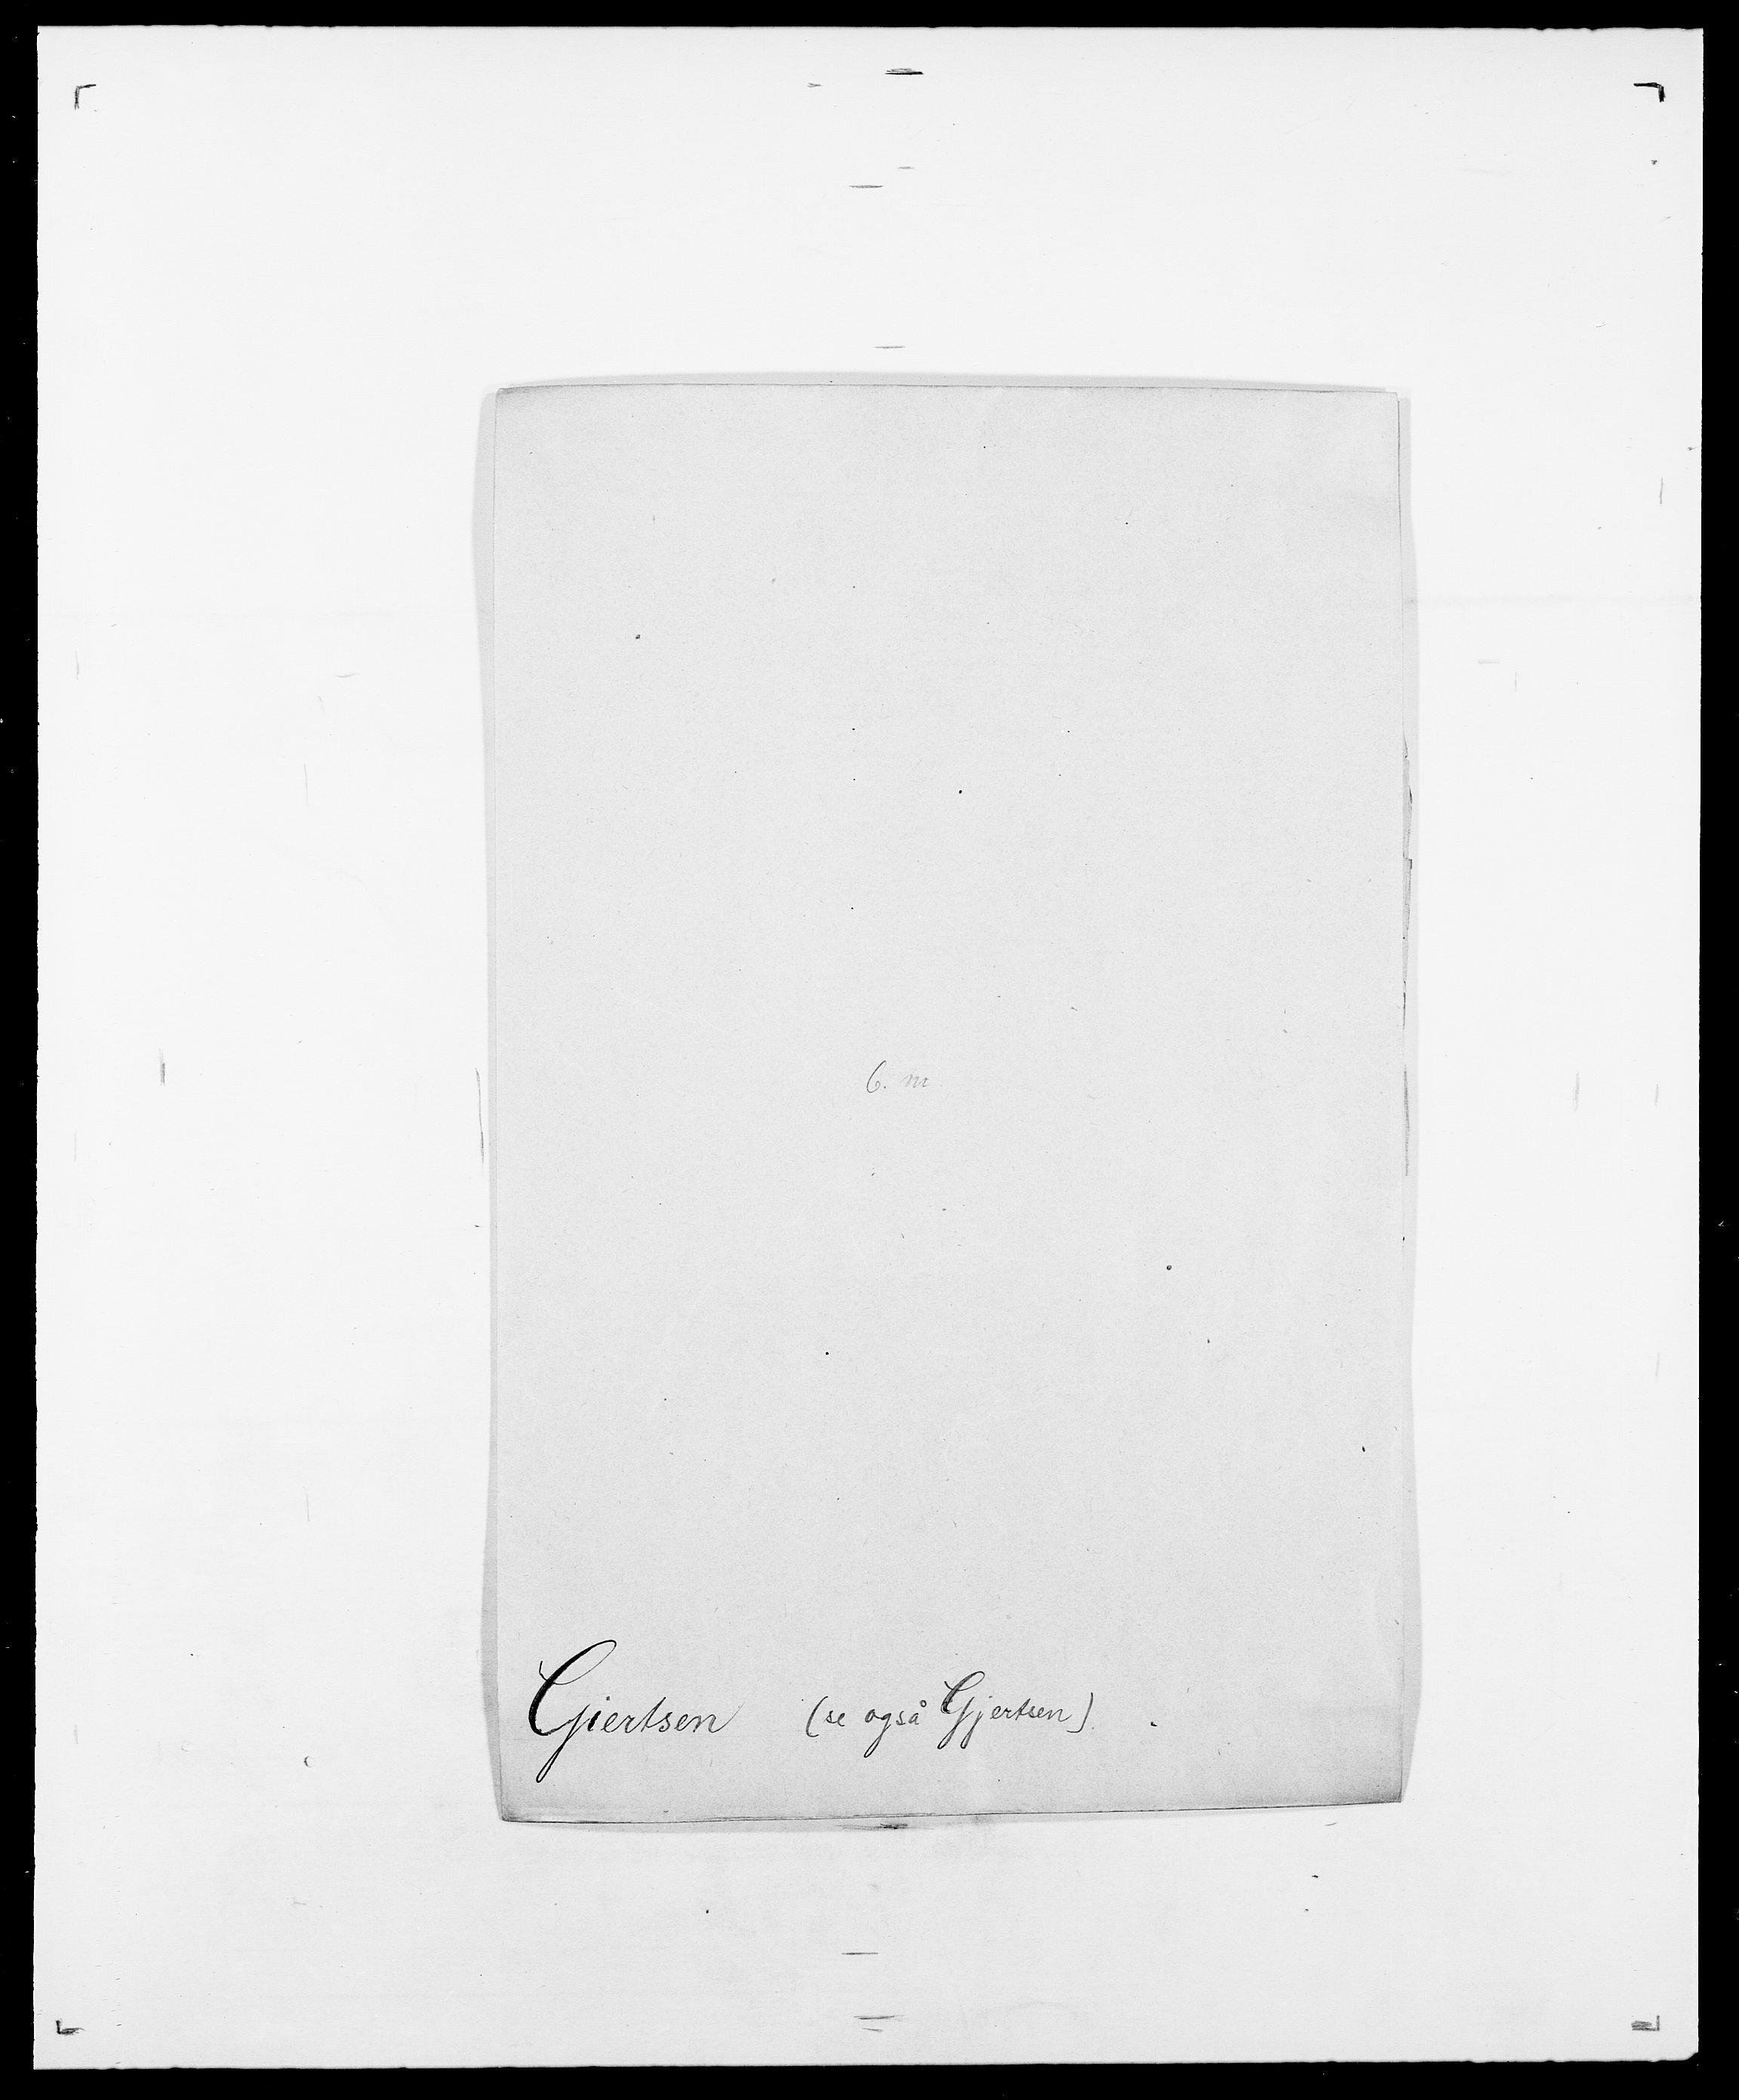 SAO, Delgobe, Charles Antoine - samling, D/Da/L0014: Giebdhausen - Grip, s. 9